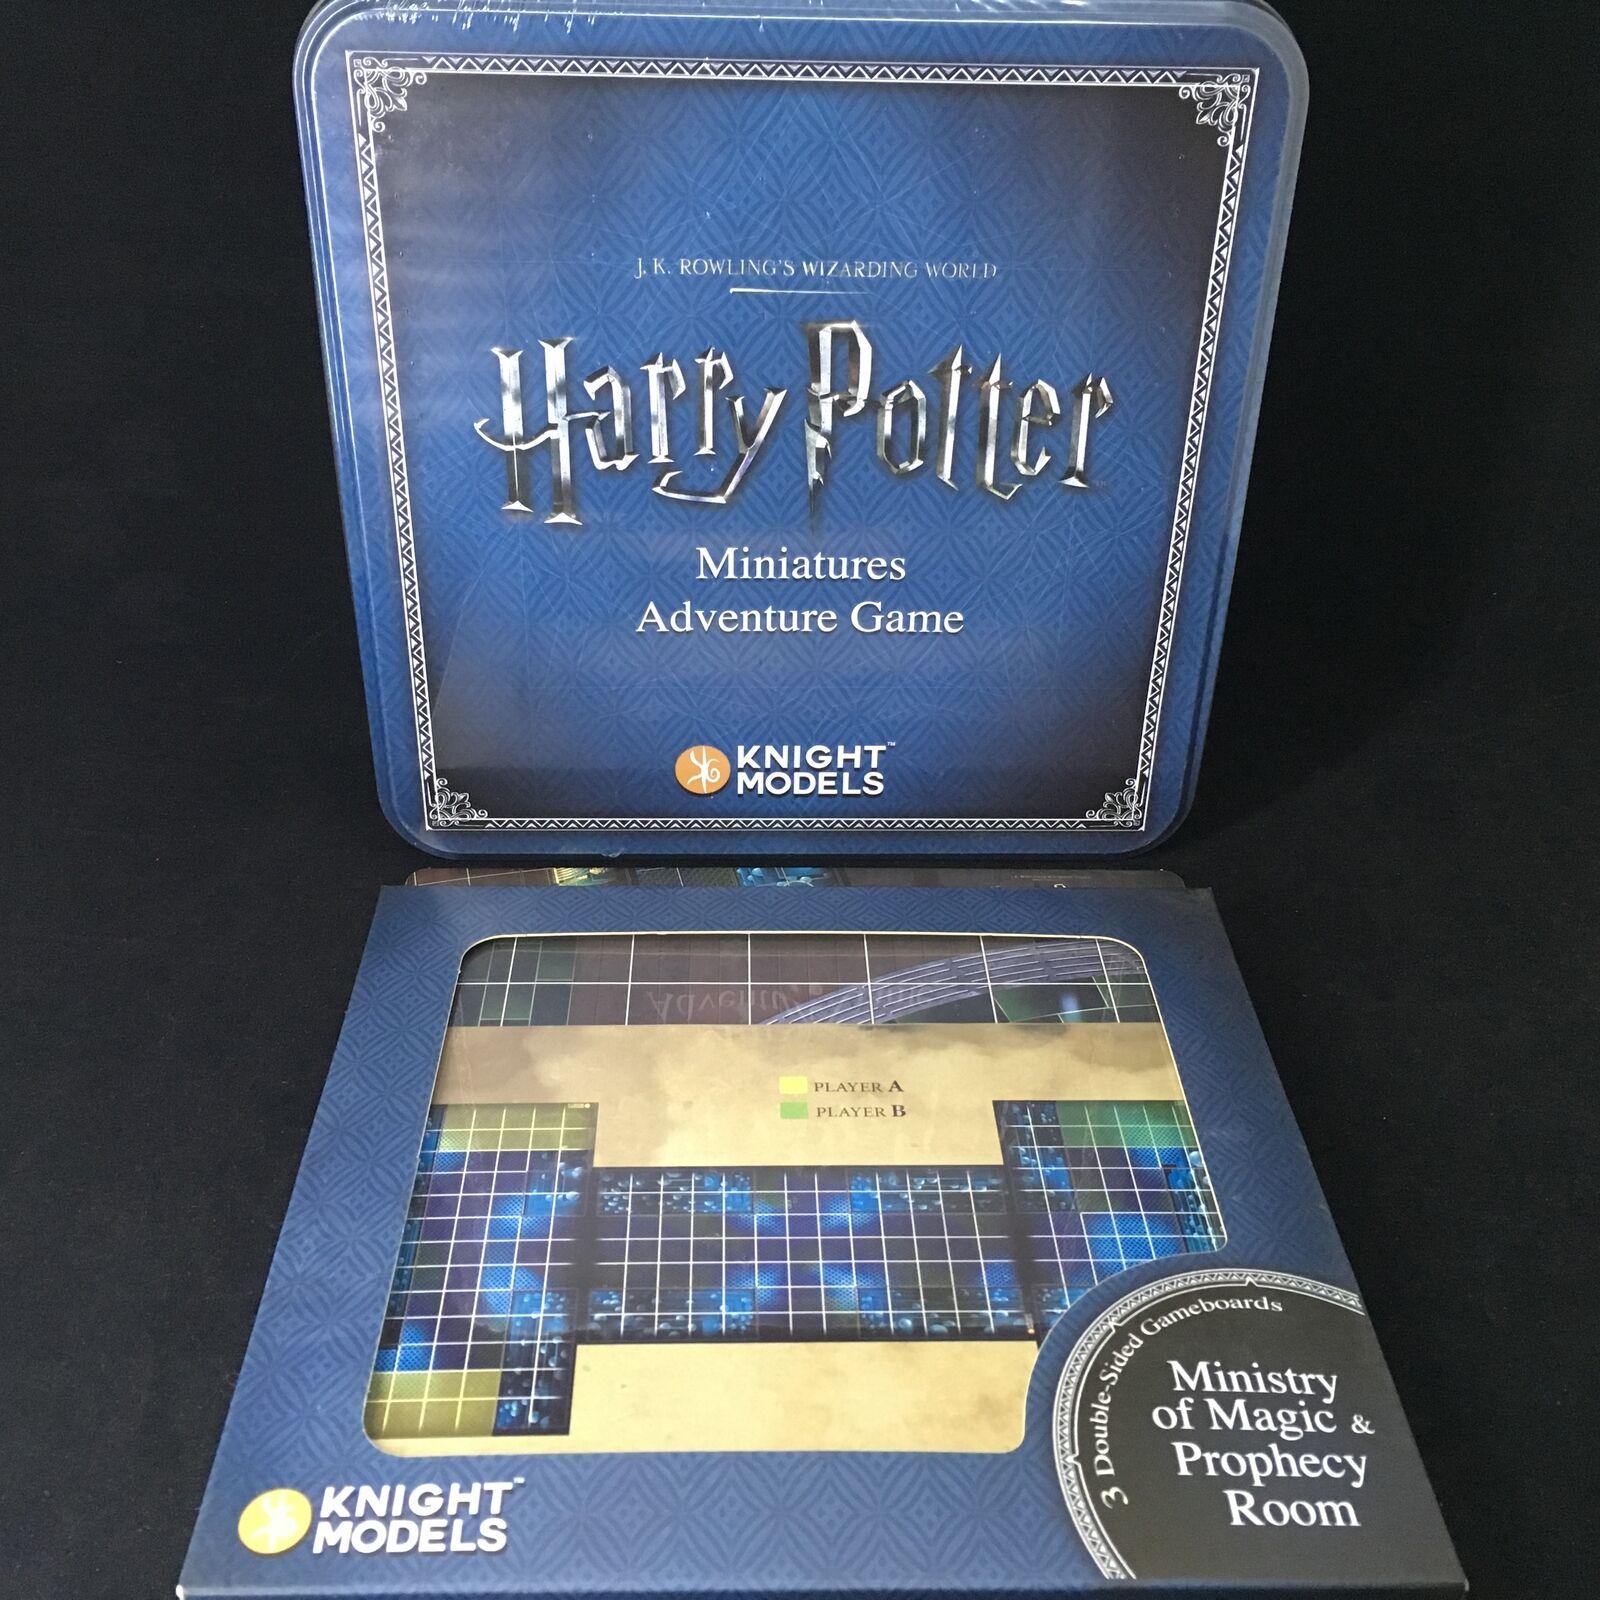 Harry Potter  Miniatures Jeu d'aventure Core + Ministry of Magic Expansion -...